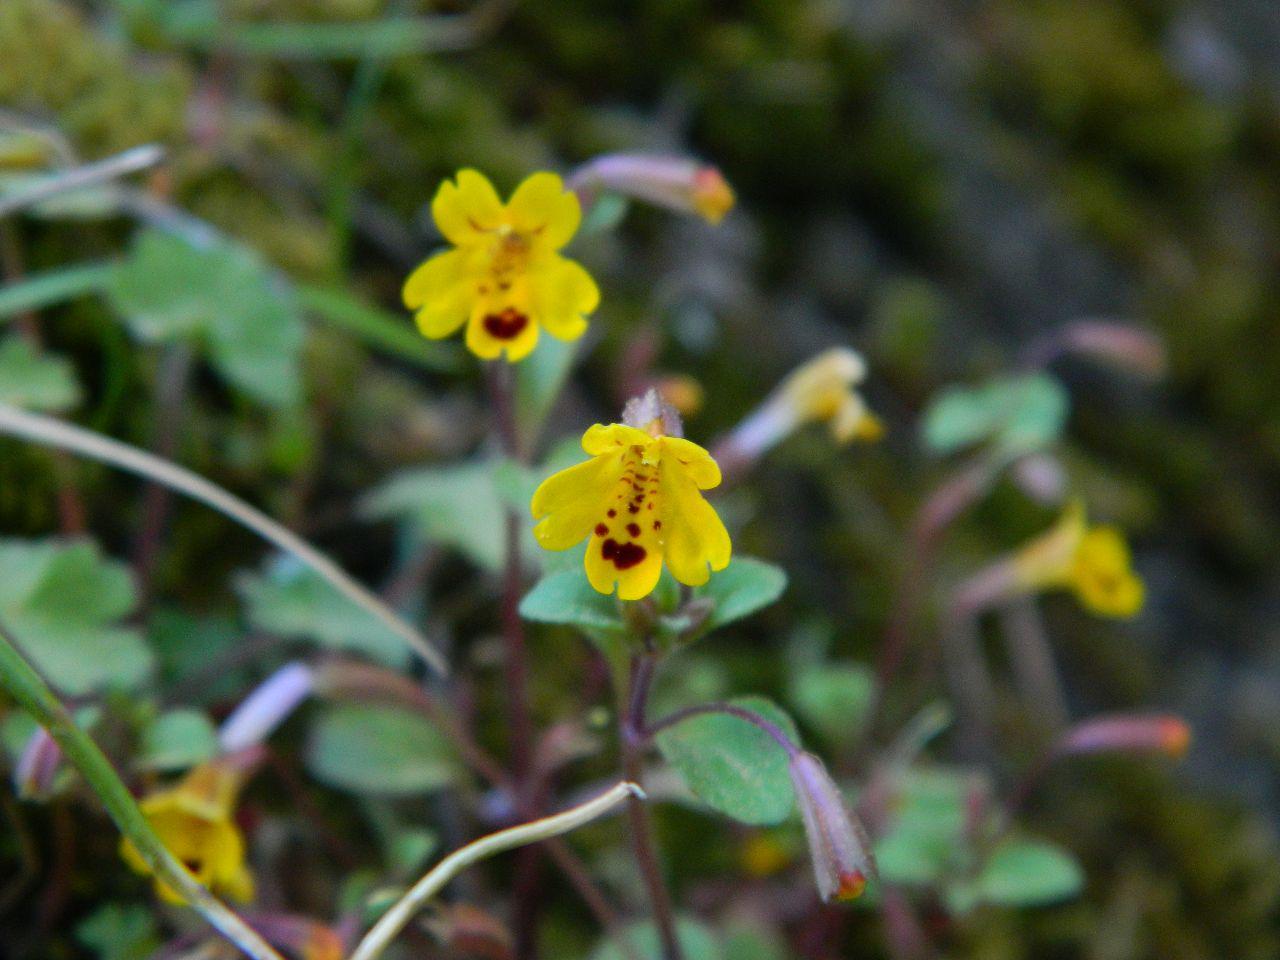 monkey flower - Mimulus alsinoides